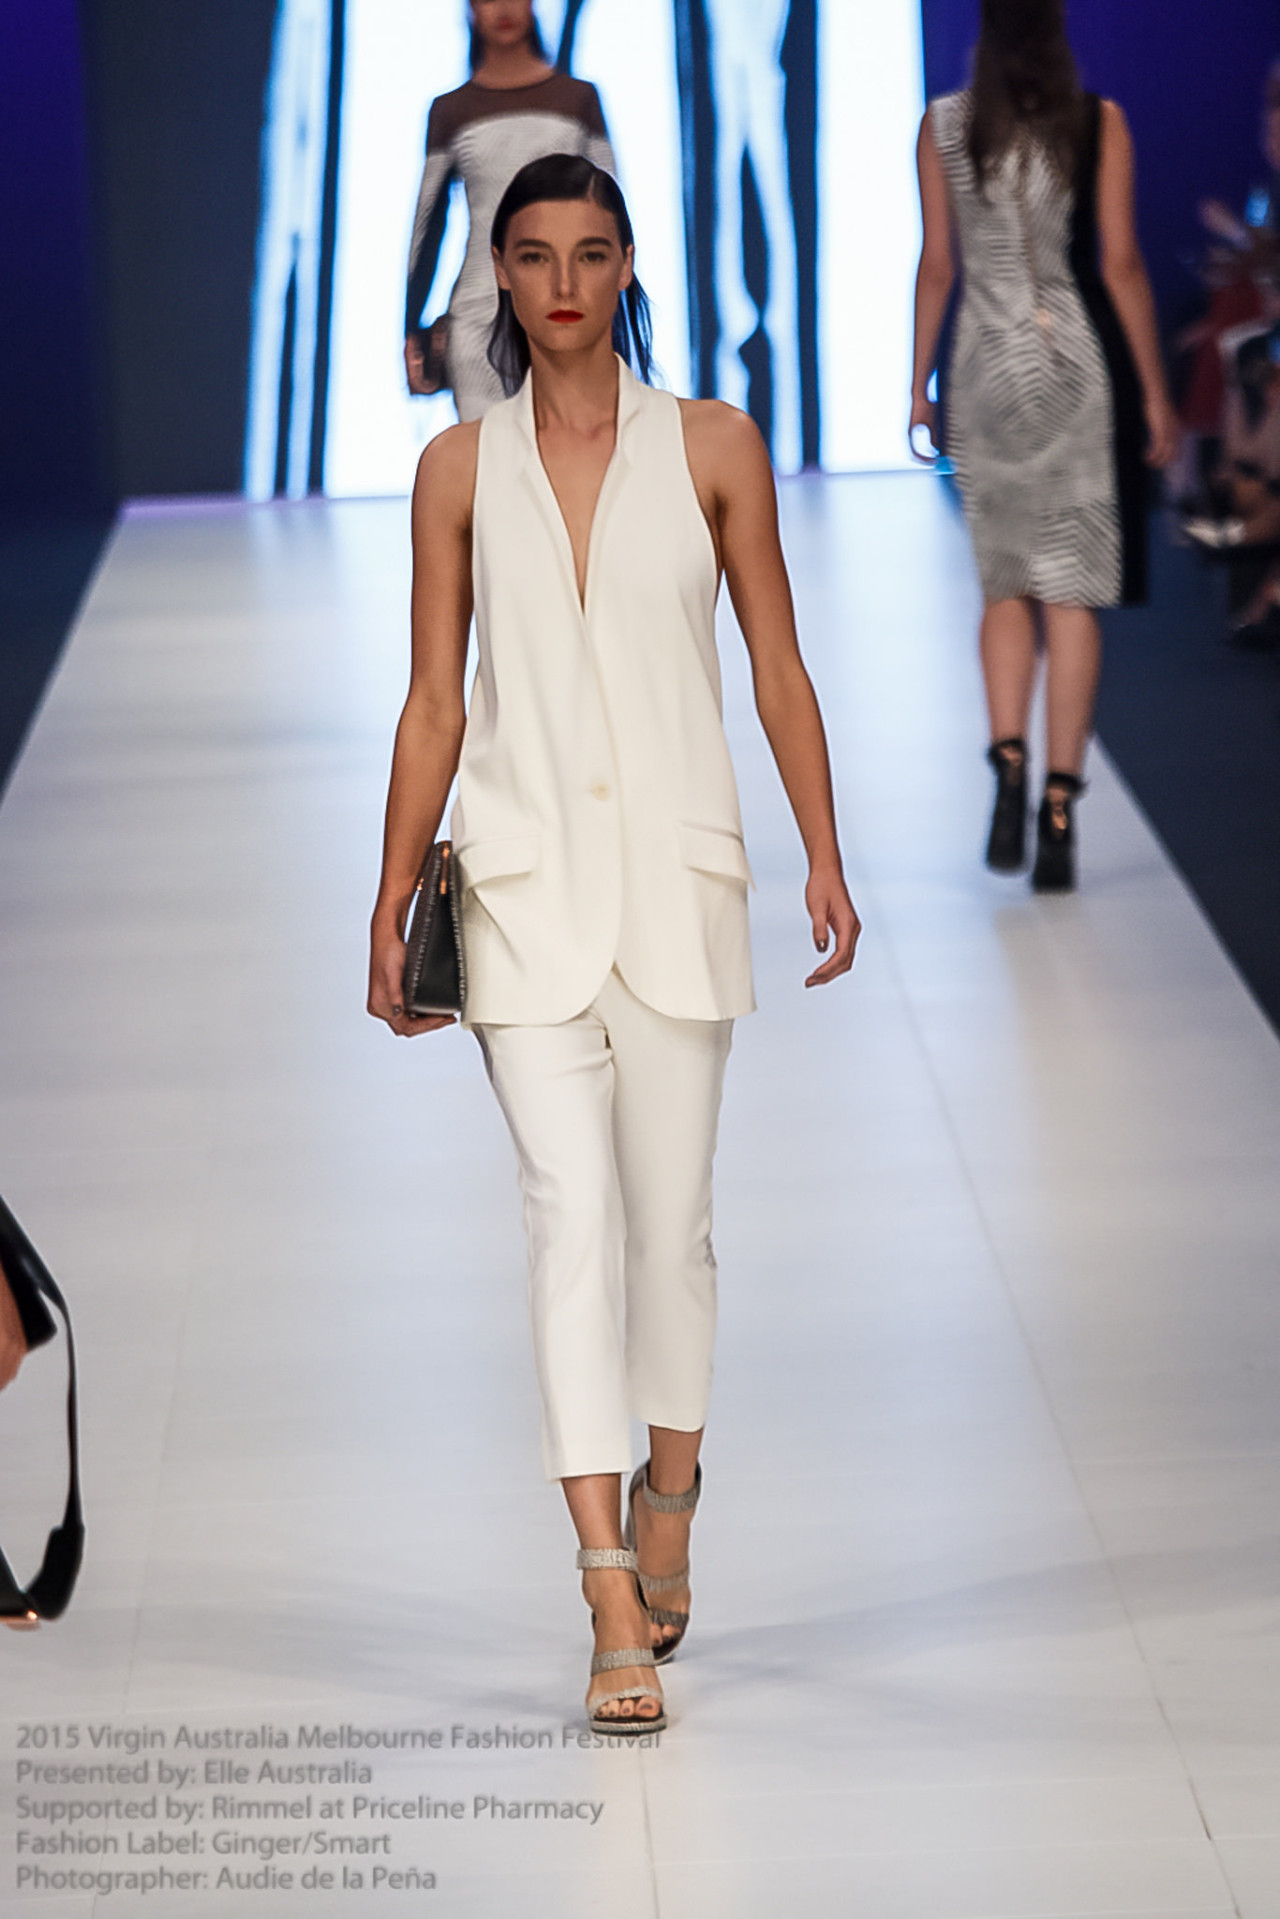 AFH - Australian Fashion House 79